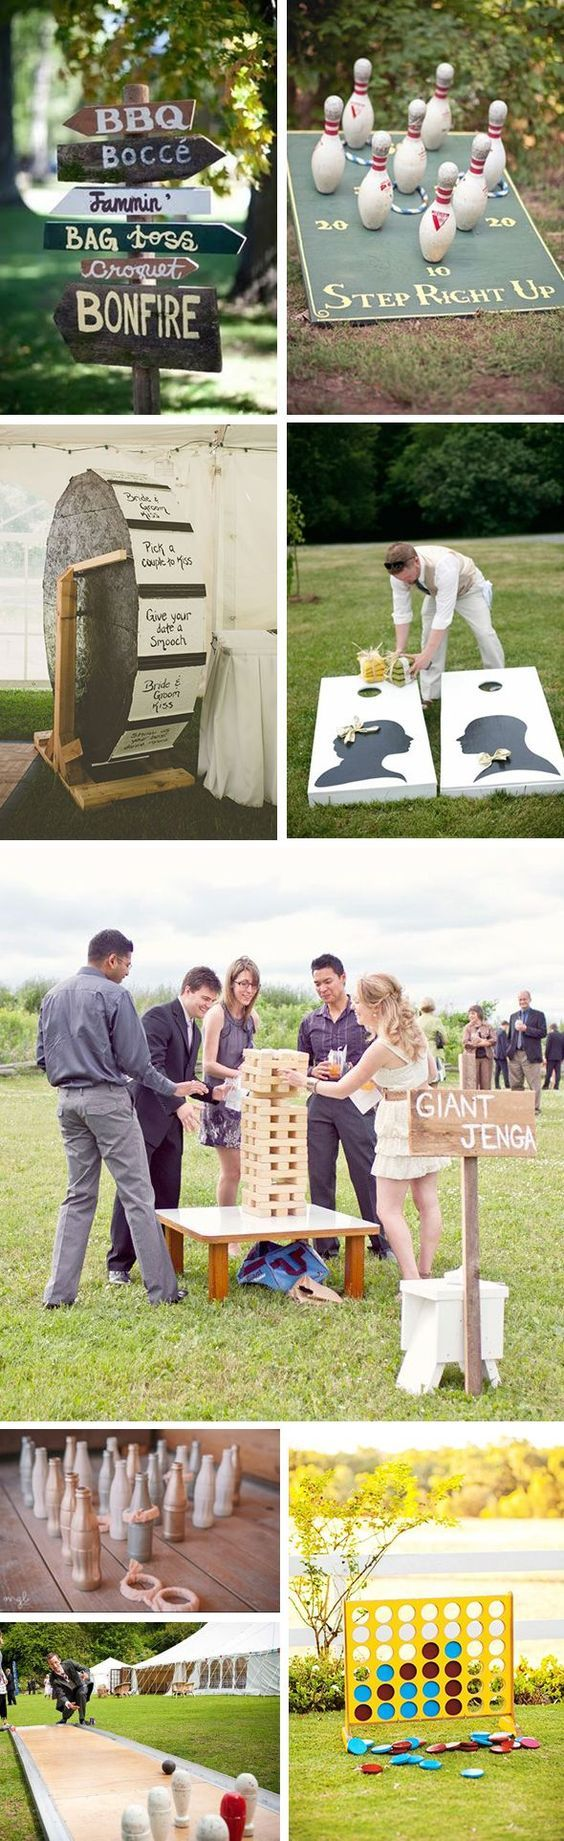 Fun at the Wedding | Our Secret Wedding: